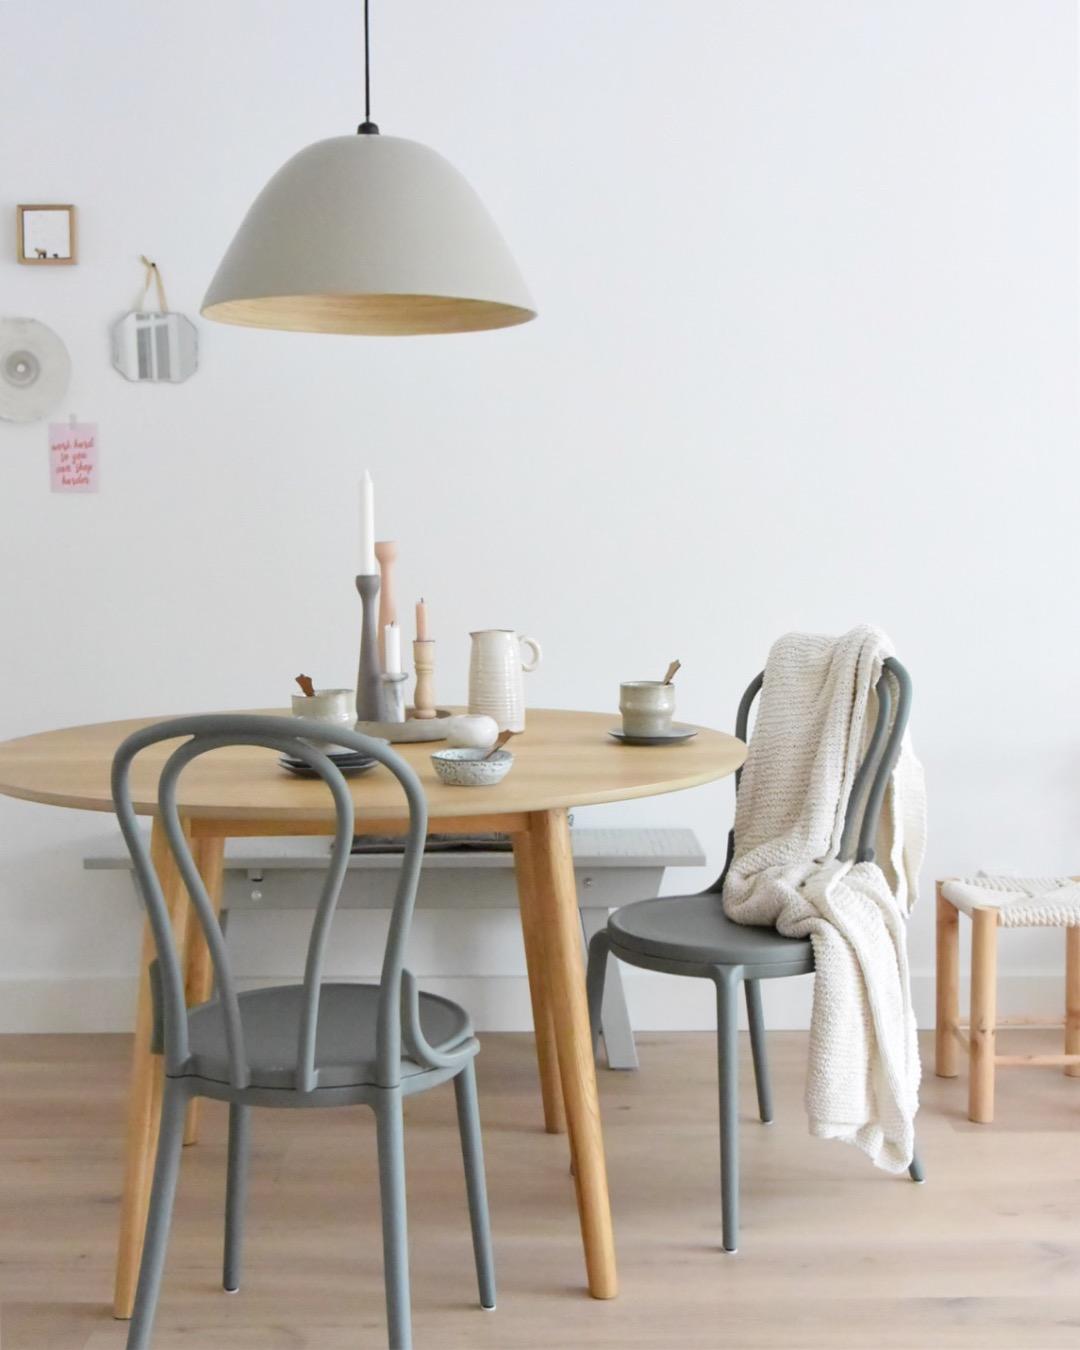 selinesteba.com - fonQ stoel idee01.JPG